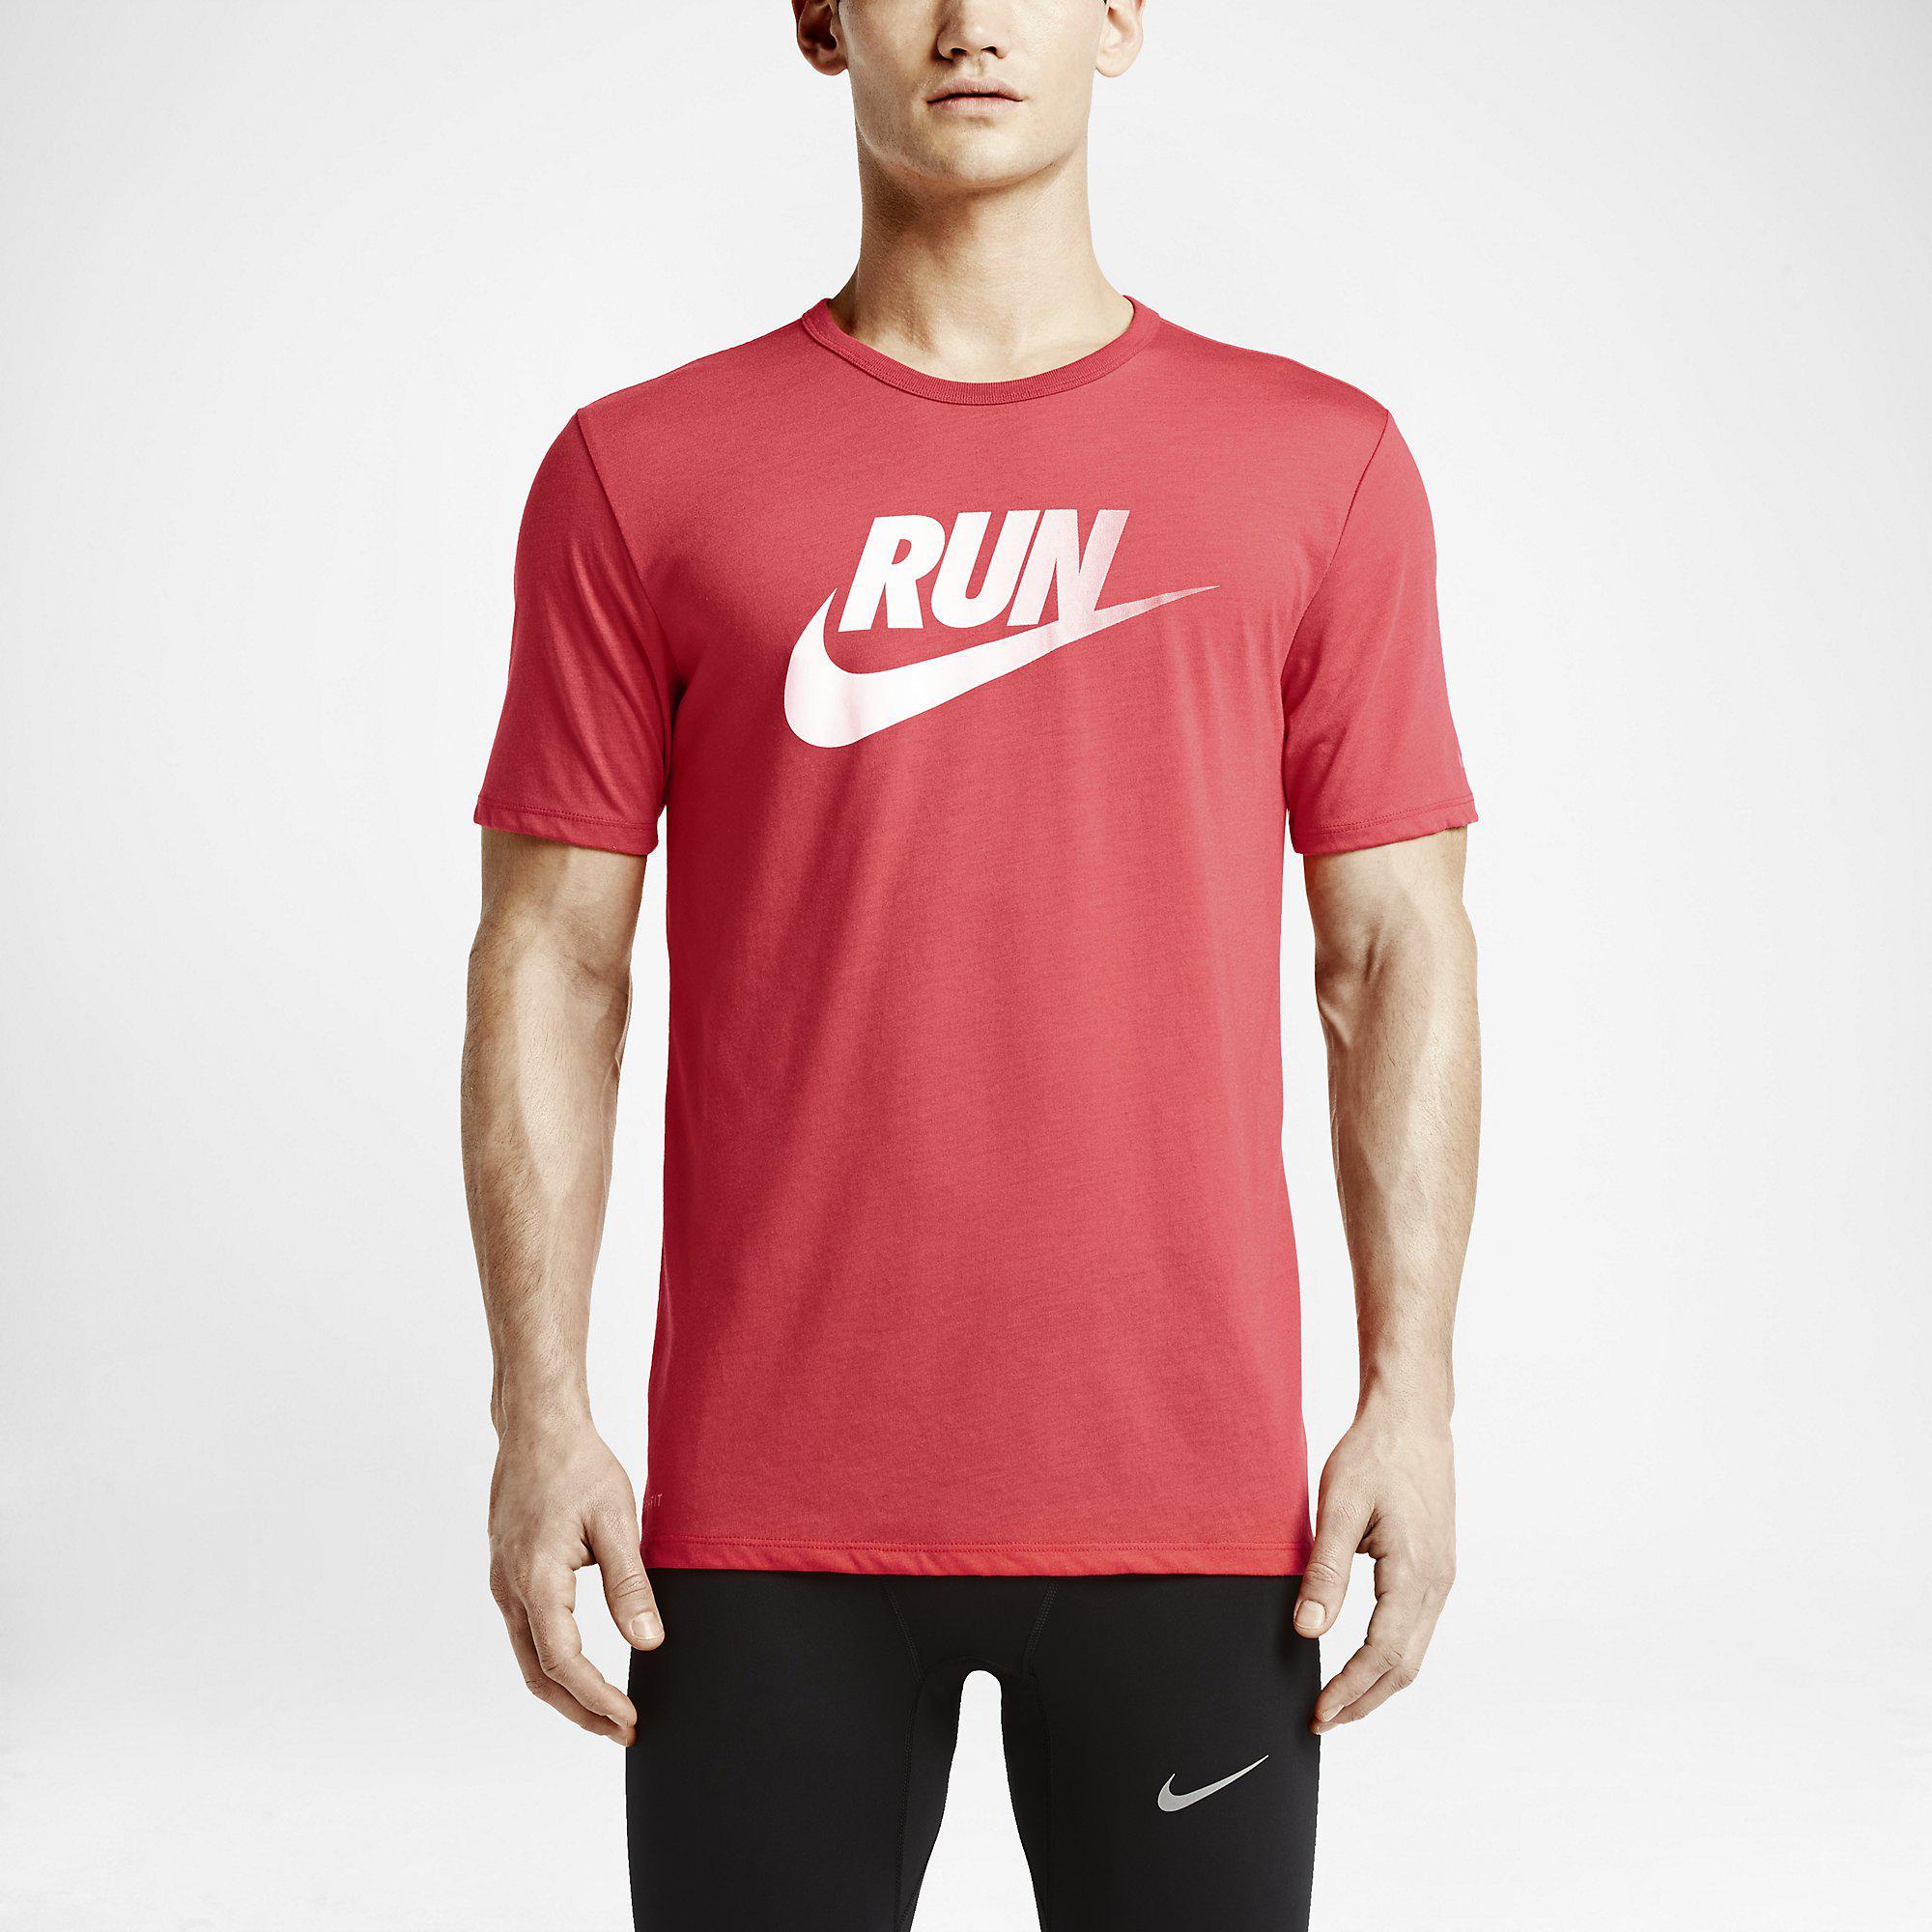 Nike Mens Run Dri Blend Swoosh Running T Shirt Daring